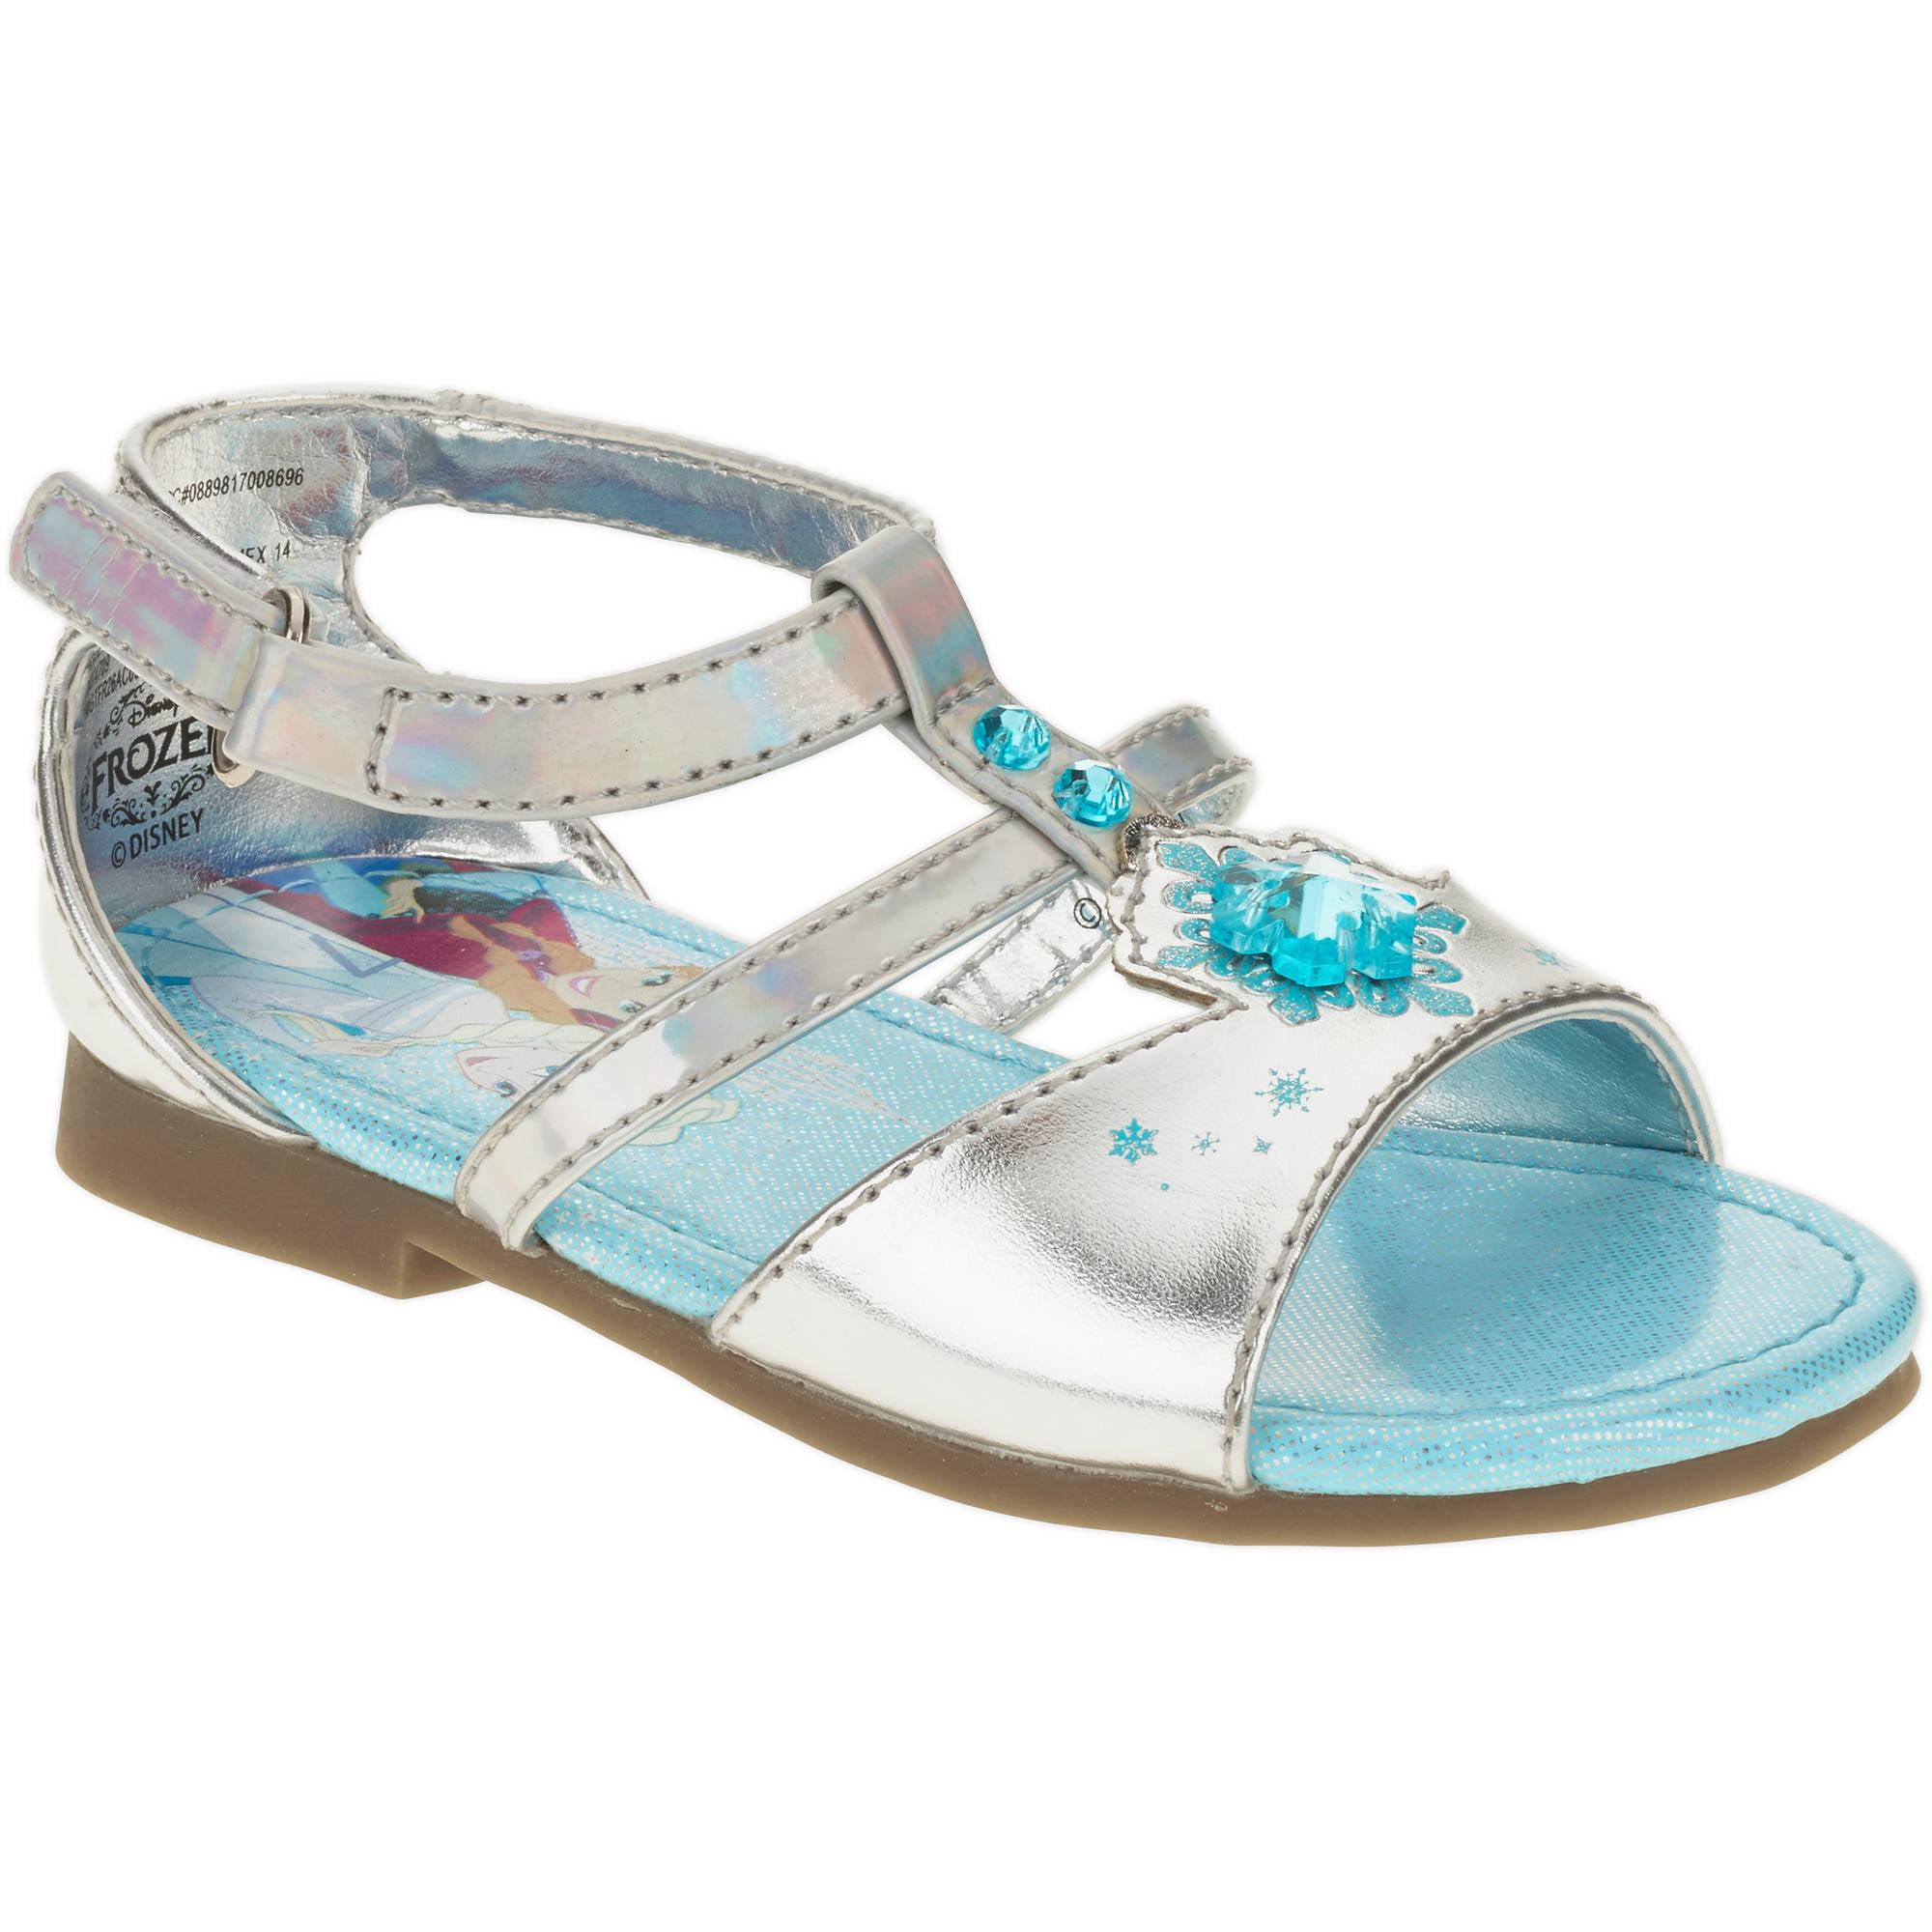 1788fa10a826 Girls  Toddler Sandal – Walmart Inventory Checker – BrickSeek